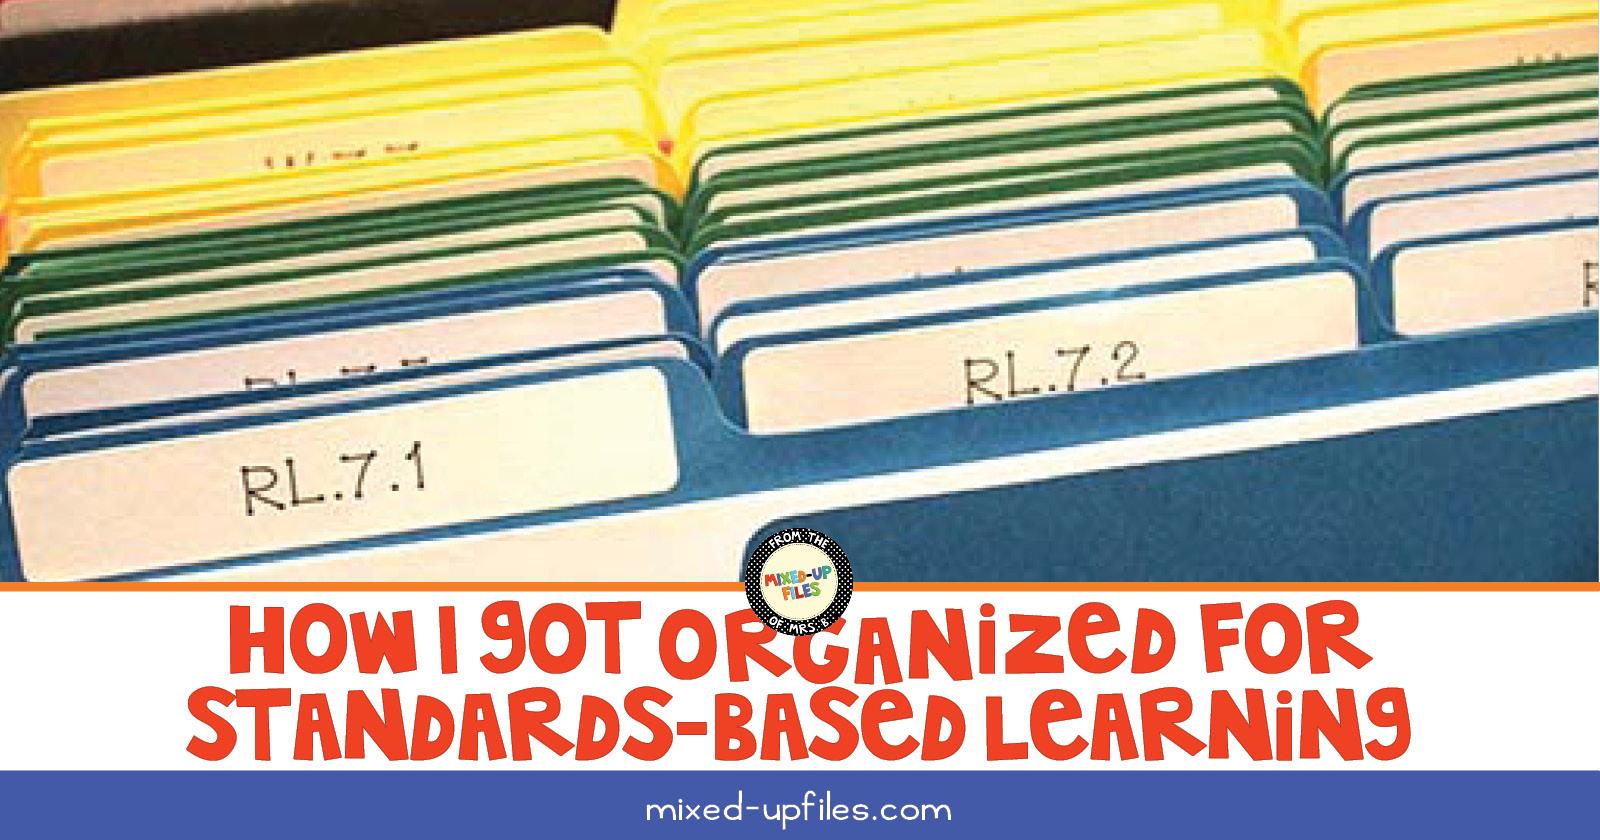 How I got organized for standards-based learning